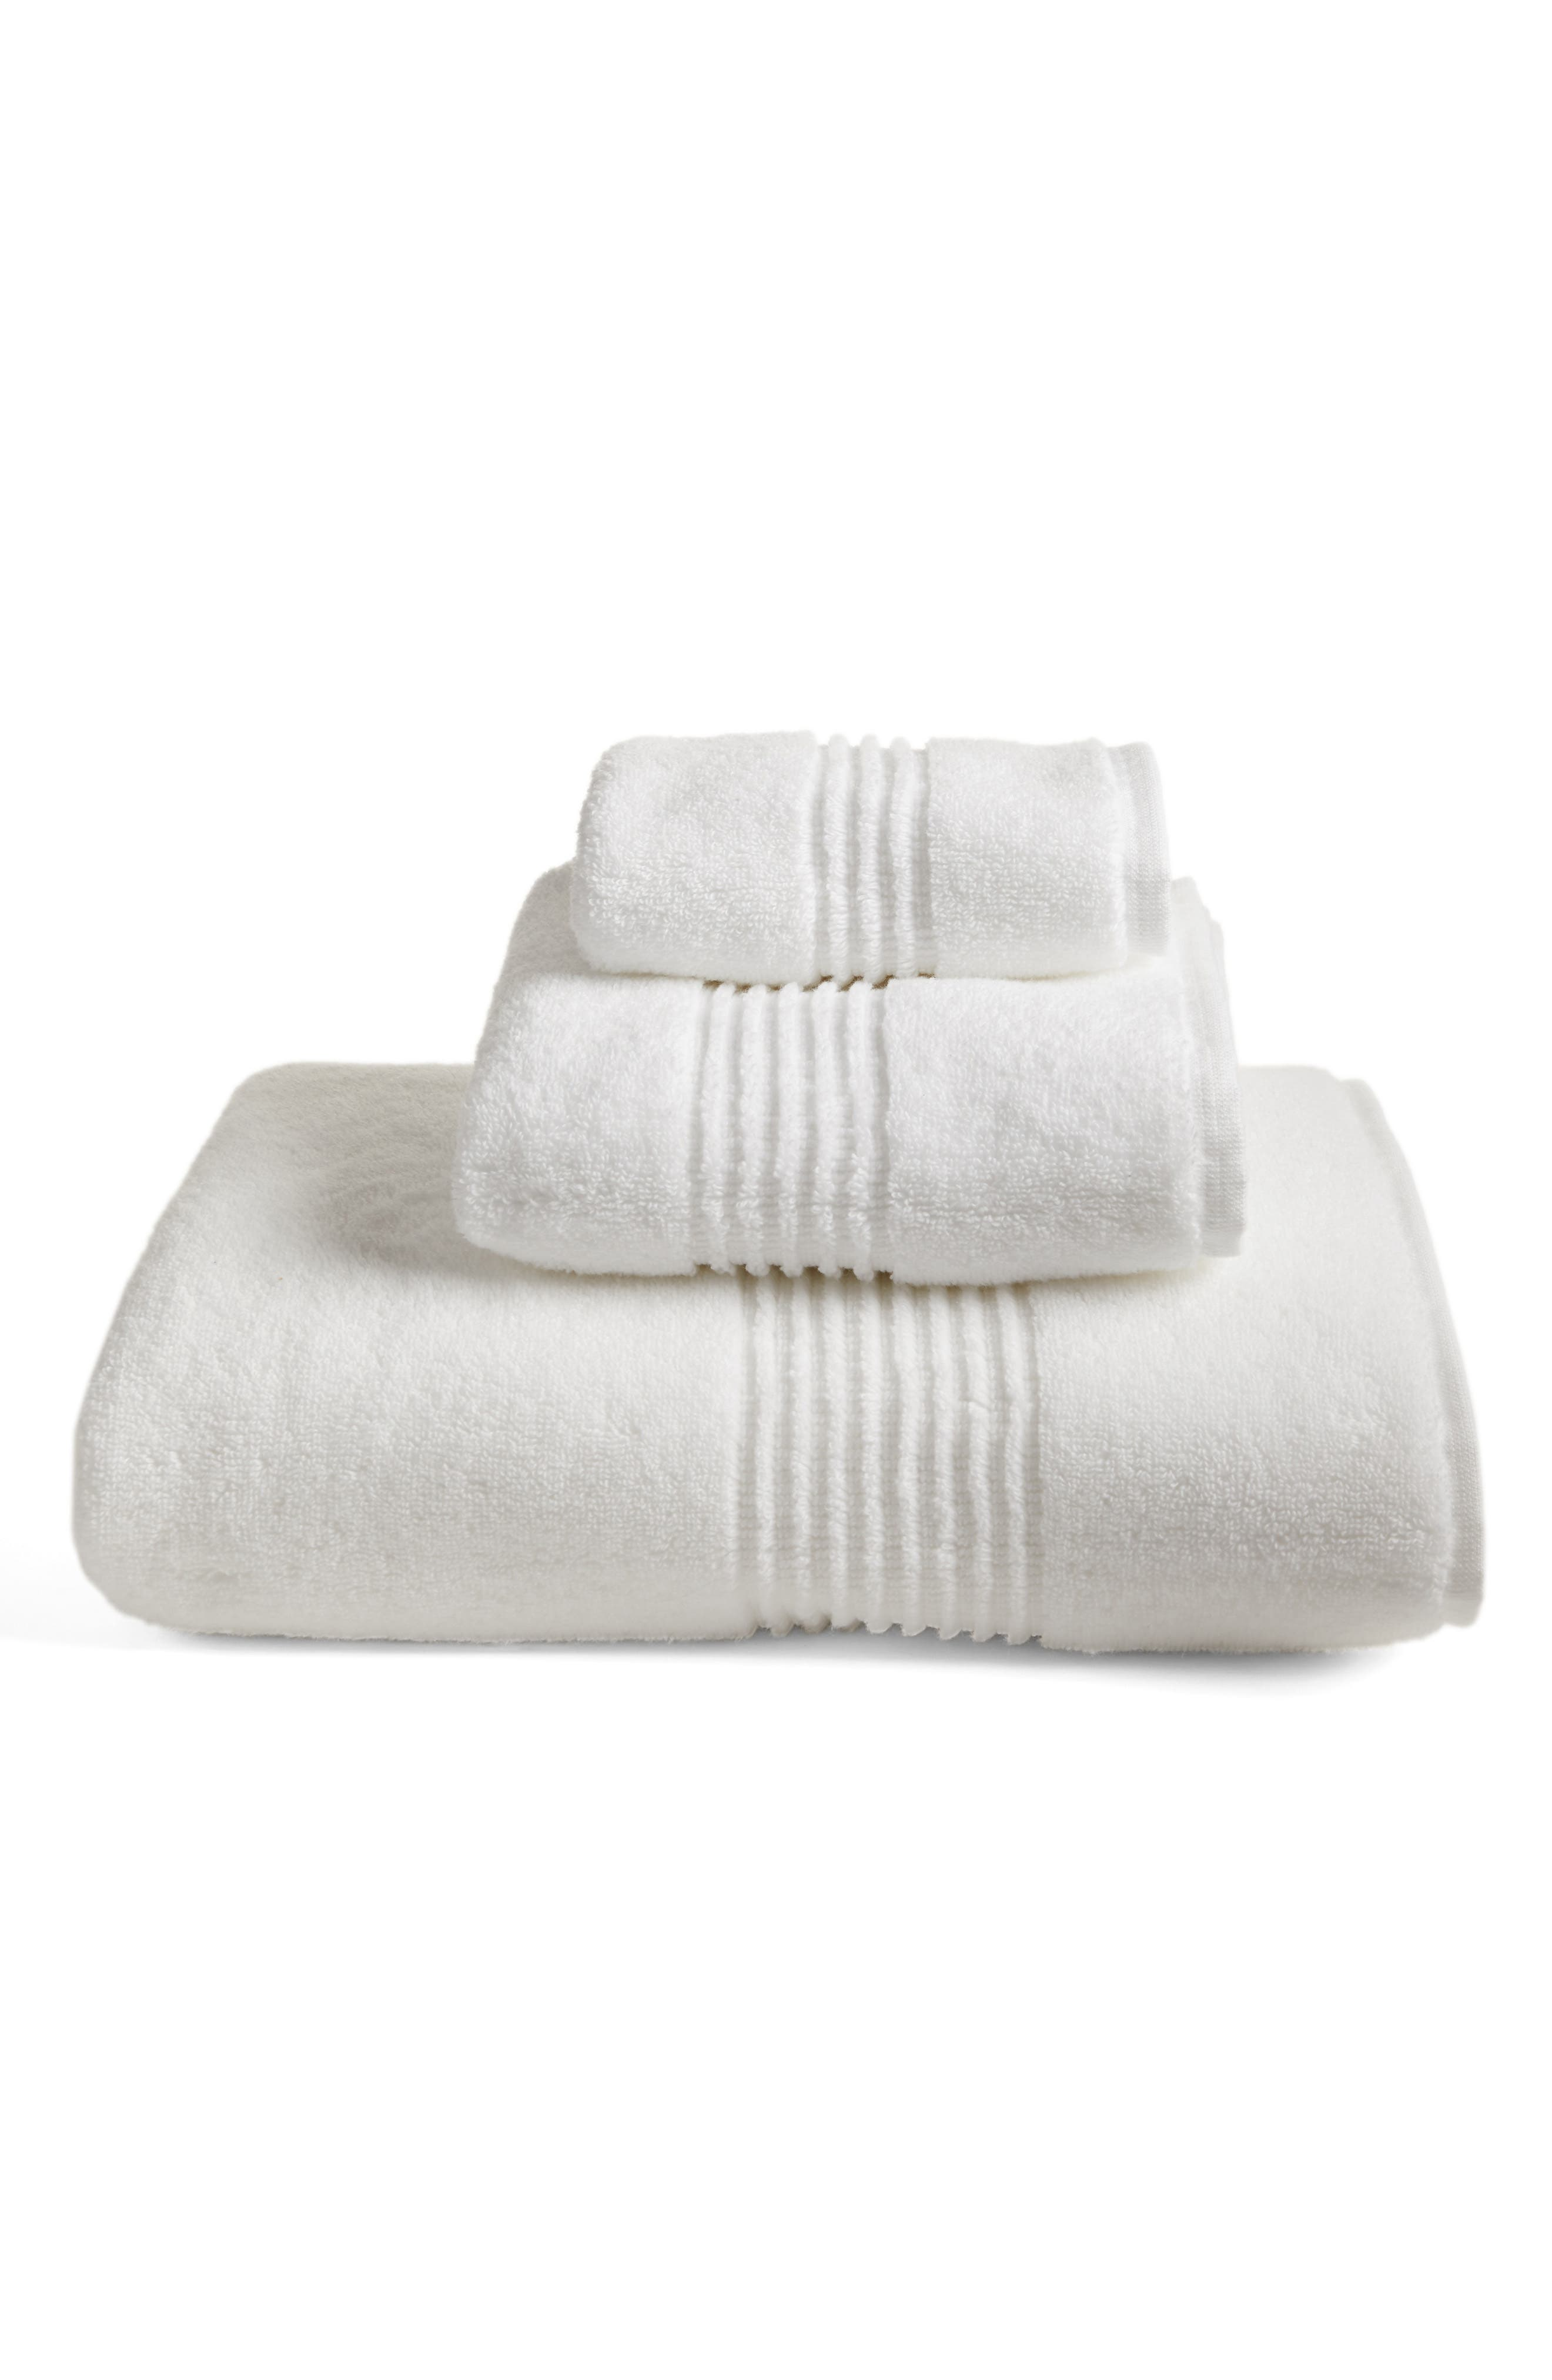 Organic Hydrocotton Heathered Bath Towel,                         Main,                         color, 100